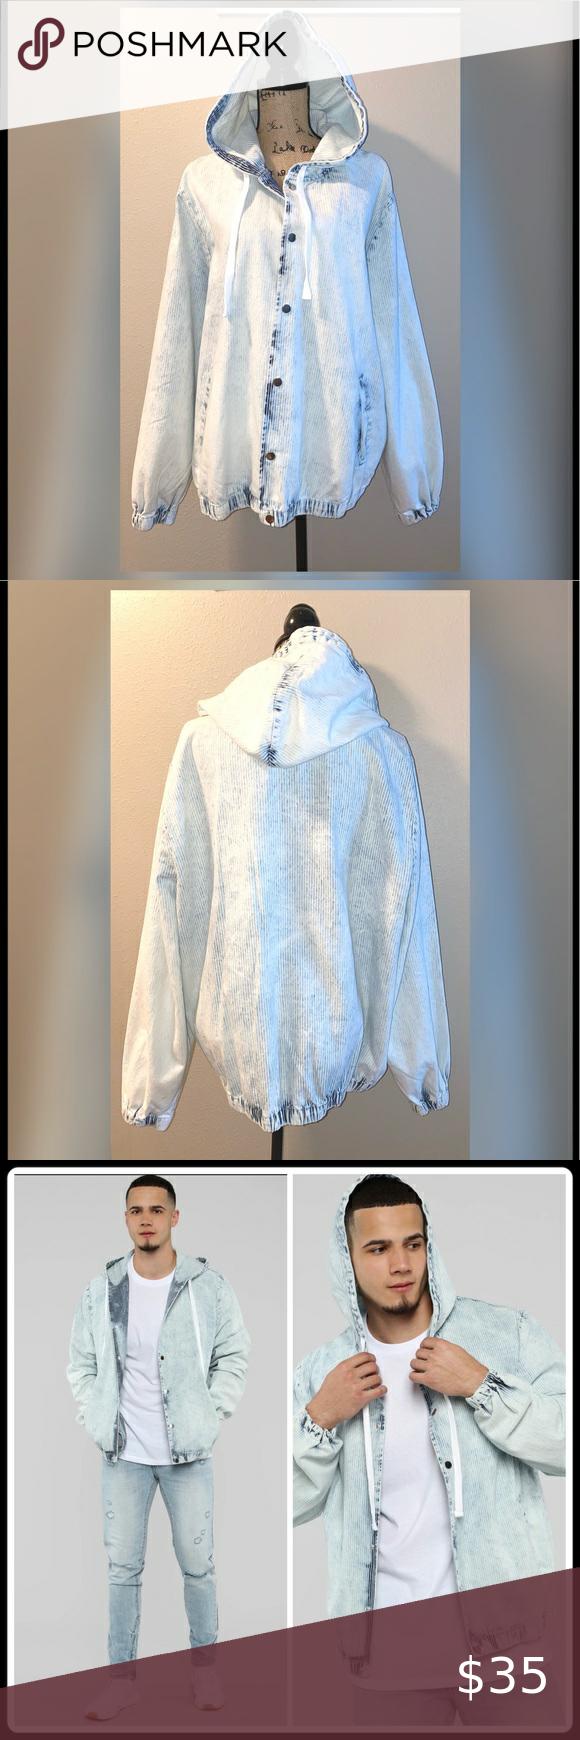 Fashion Nova Men S Jean Jacket Size Xl Fashion Mens Light Jacket Casual Jacket [ 1740 x 580 Pixel ]